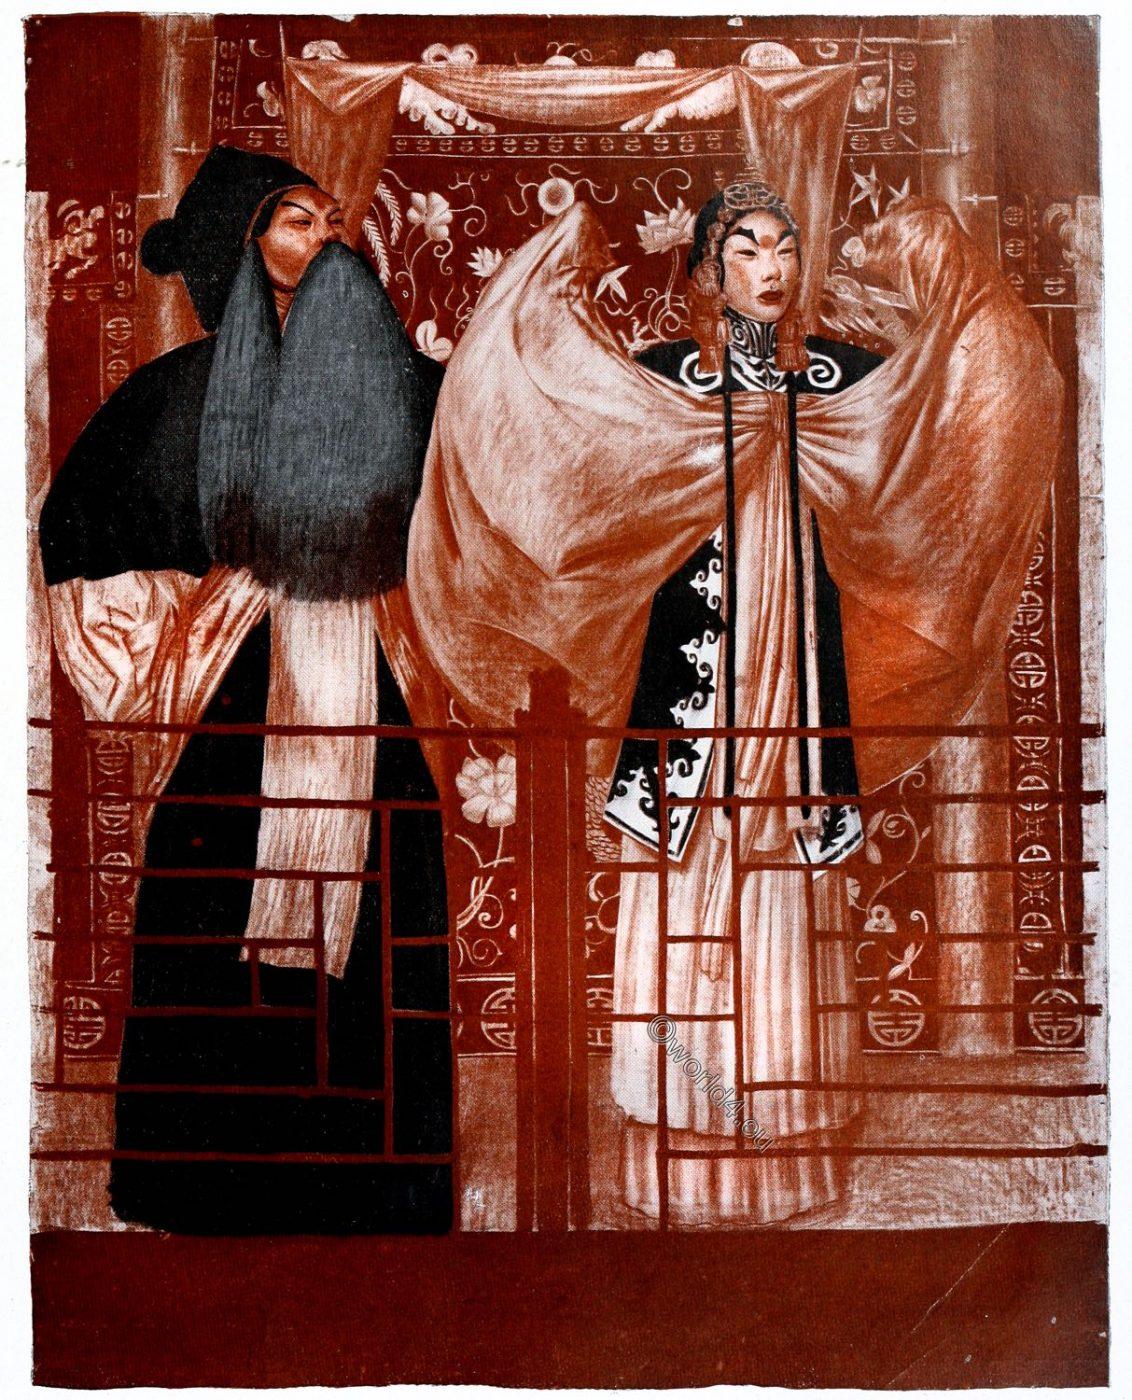 China, theatre, opera, art, actors, Alexander Jewgenjewitsch Jakowlew